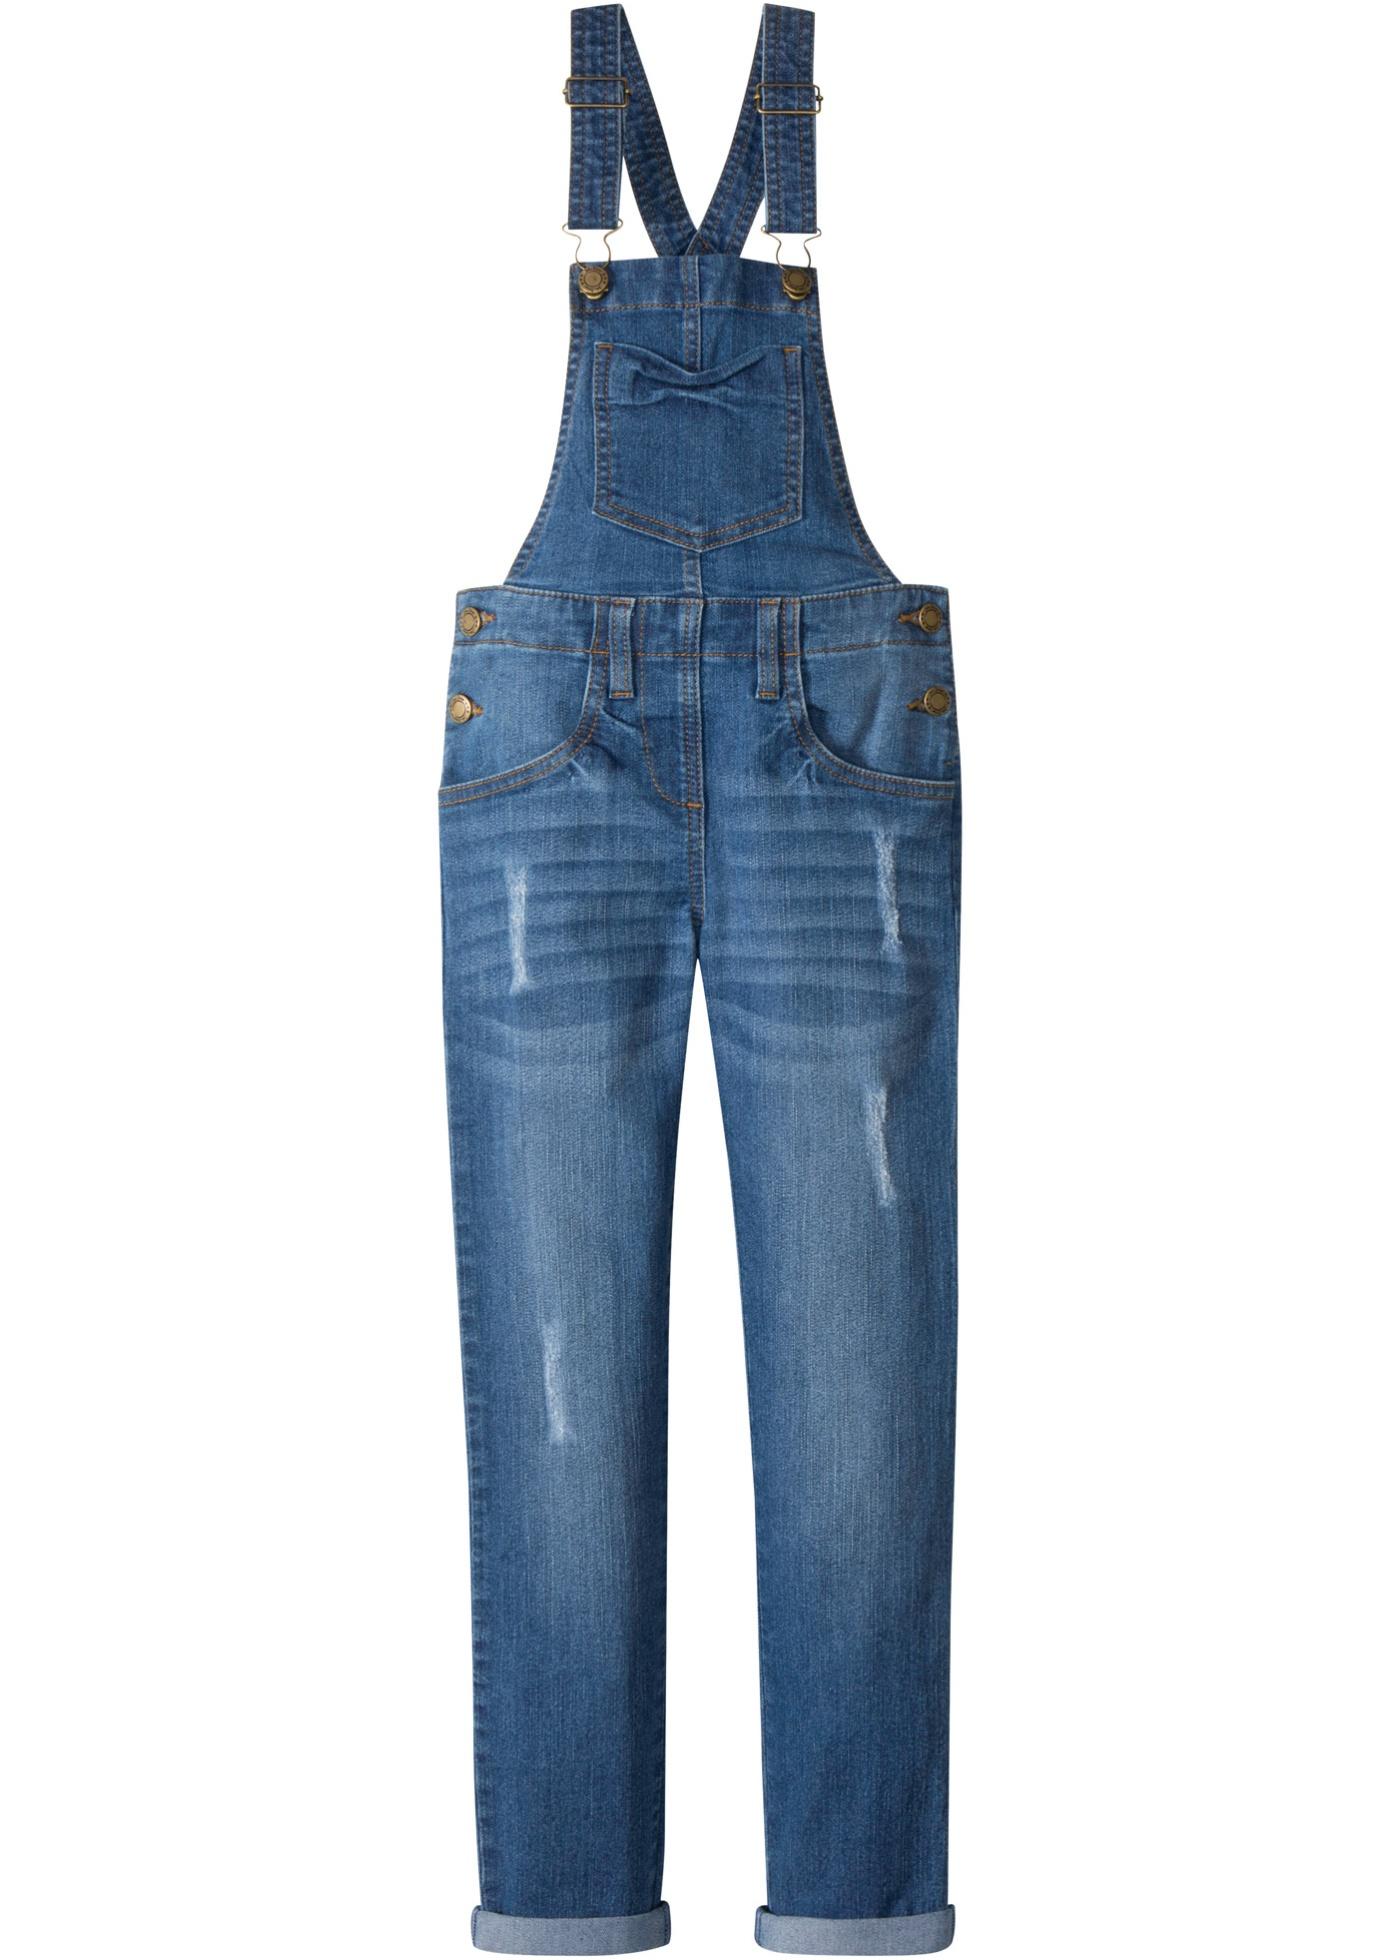 Kalhoty s laclem damske dzinove  fcd98f521a